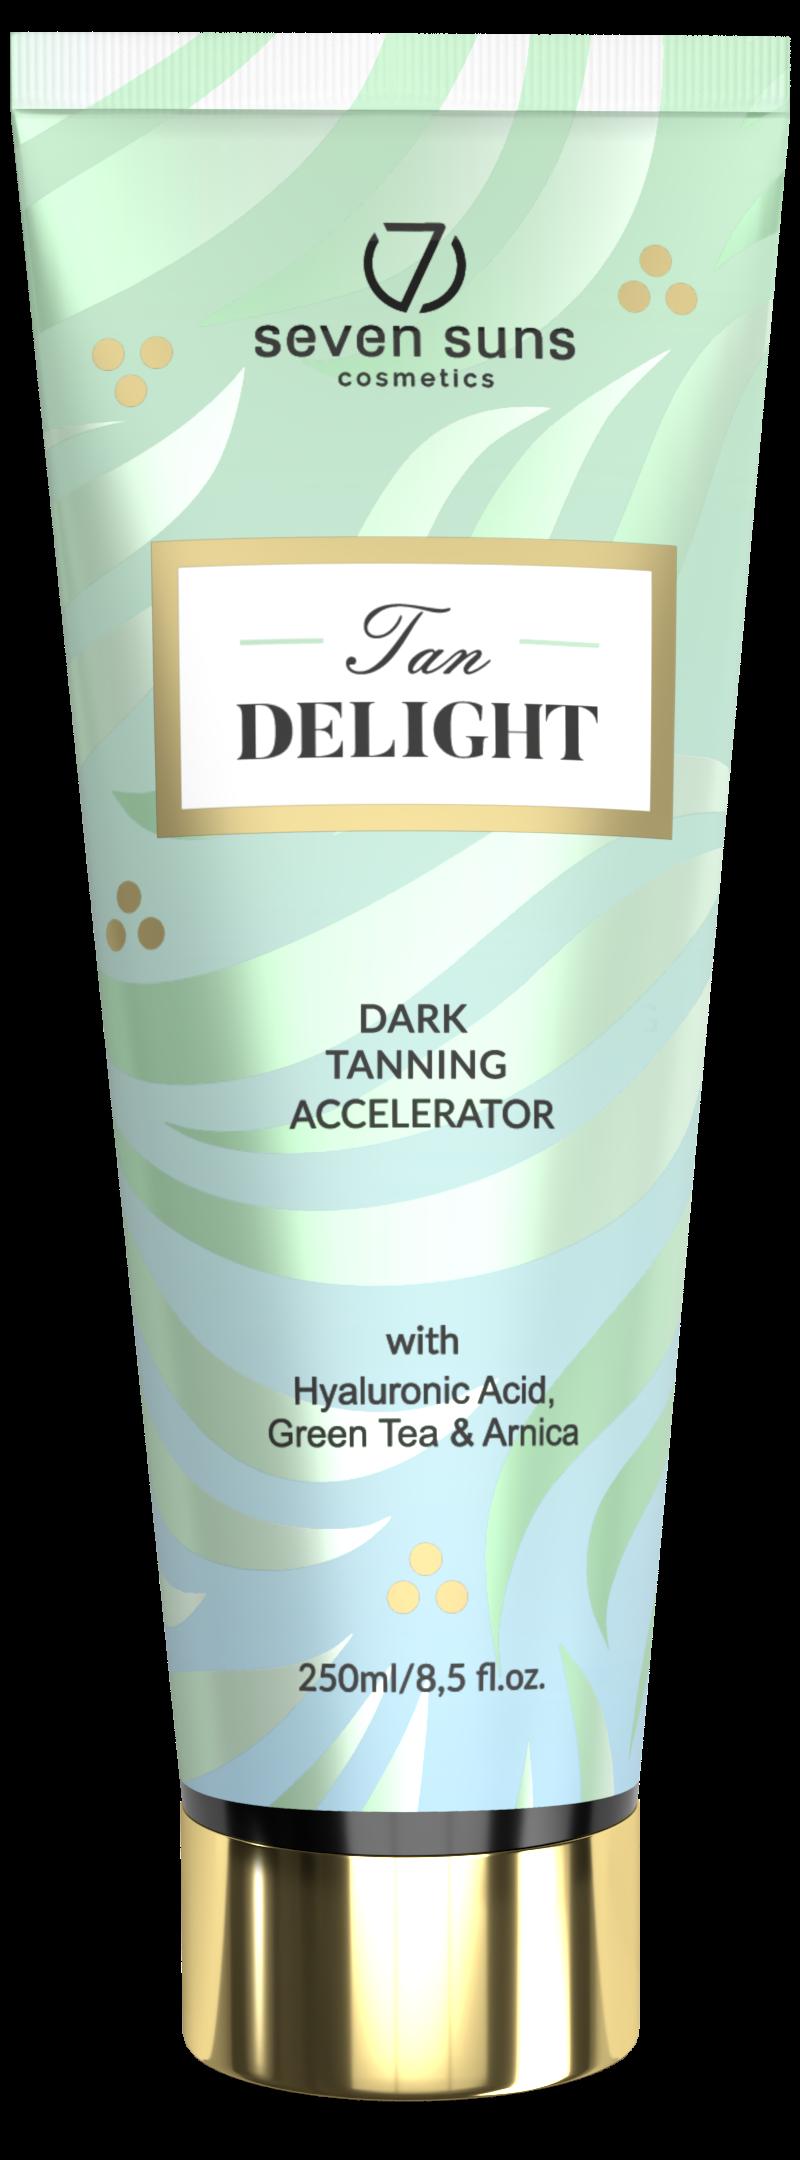 Tan Delight tanning accelerator tube